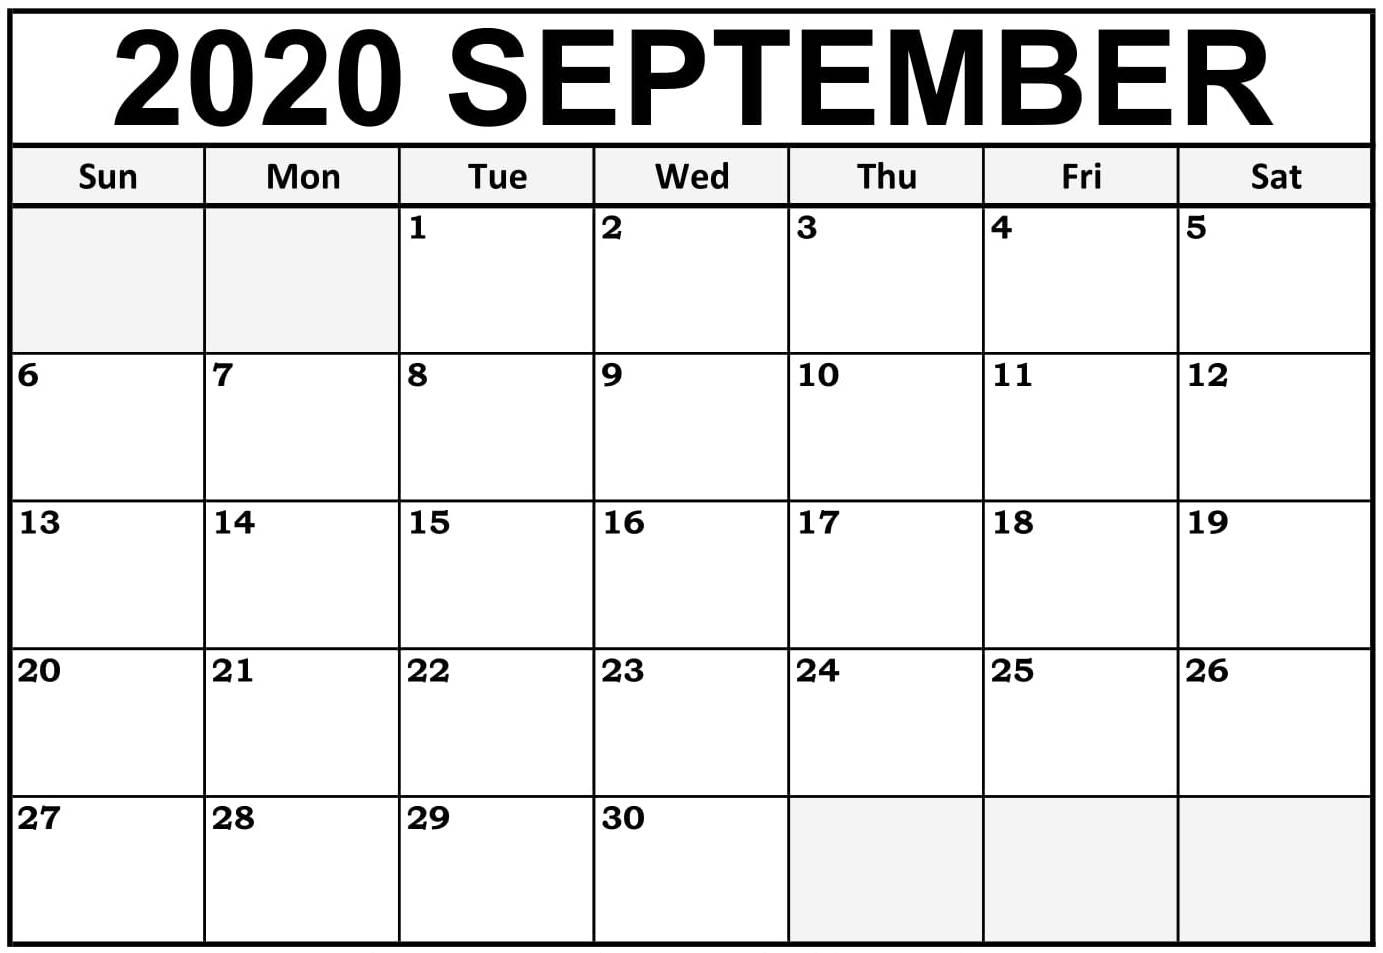 September 2020 Calendar Page